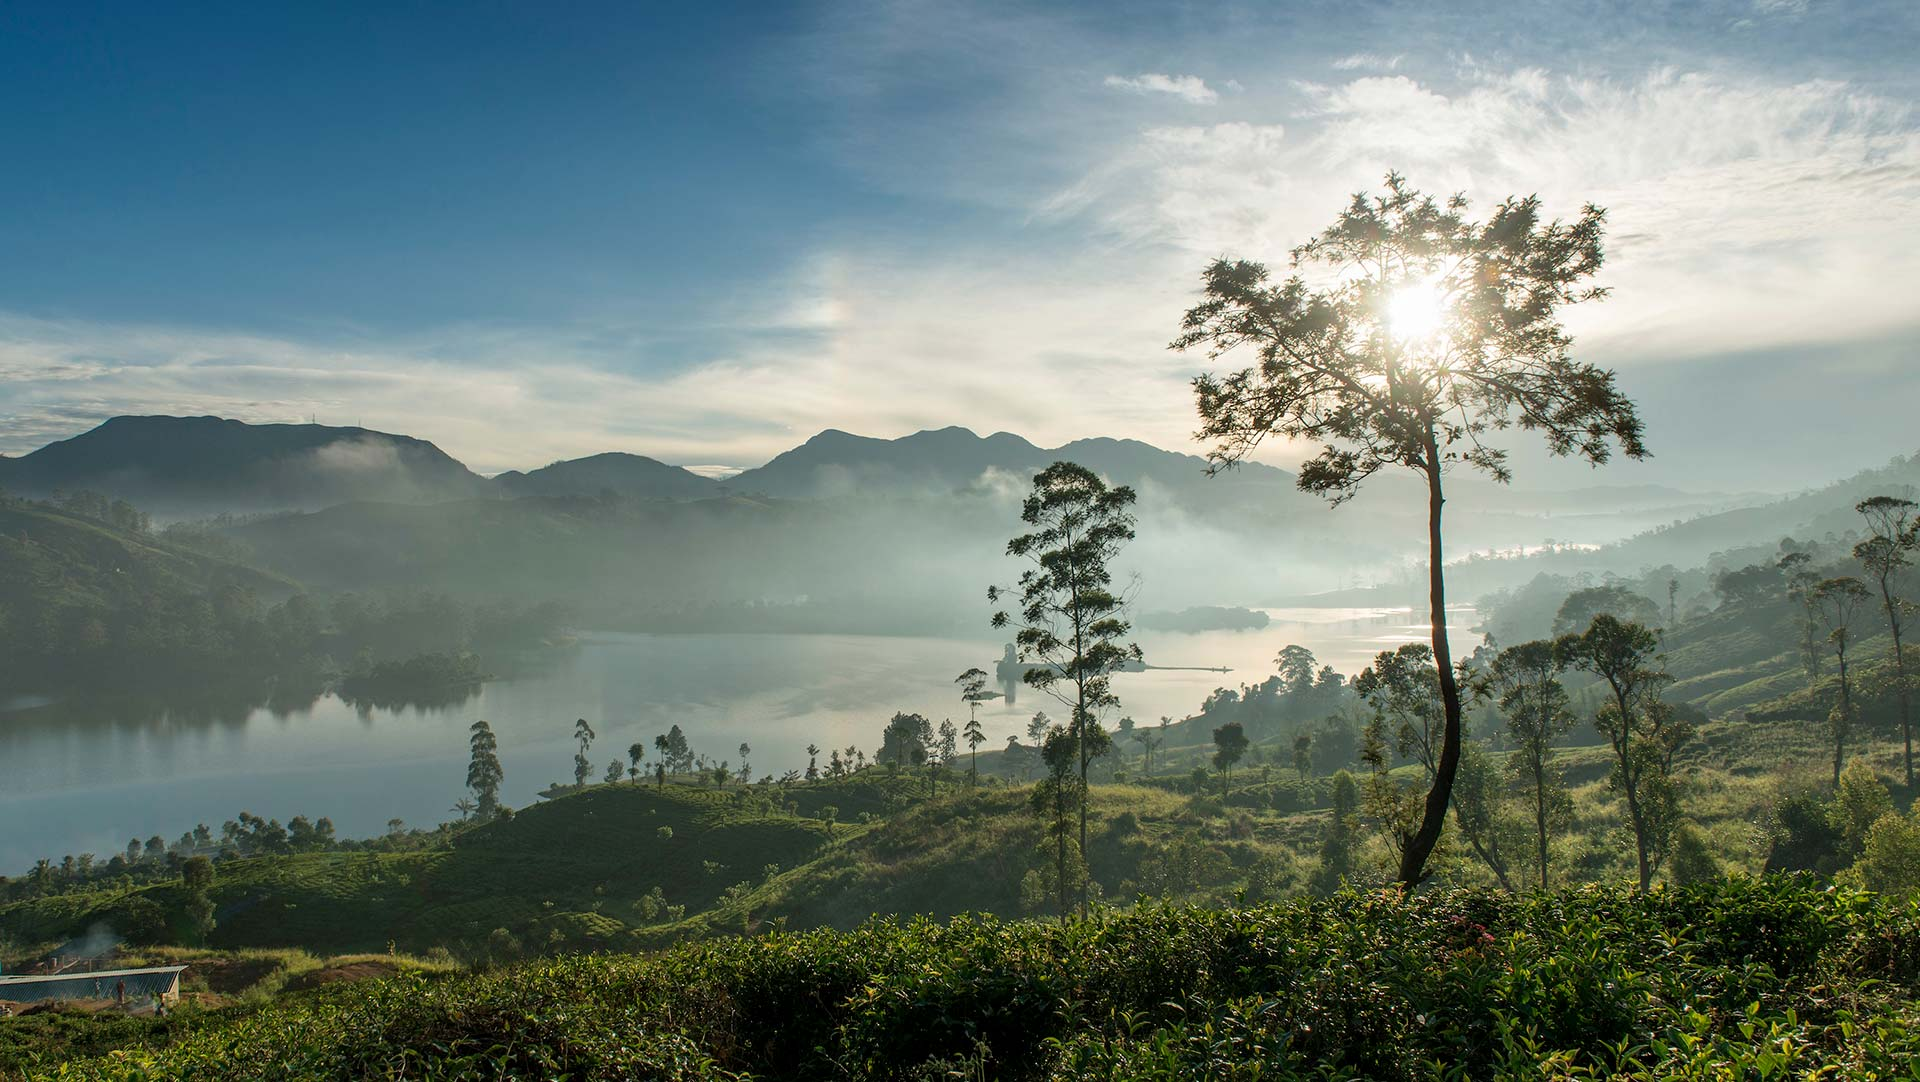 View of Castlereagh lake, Hatton, Sri Lanka